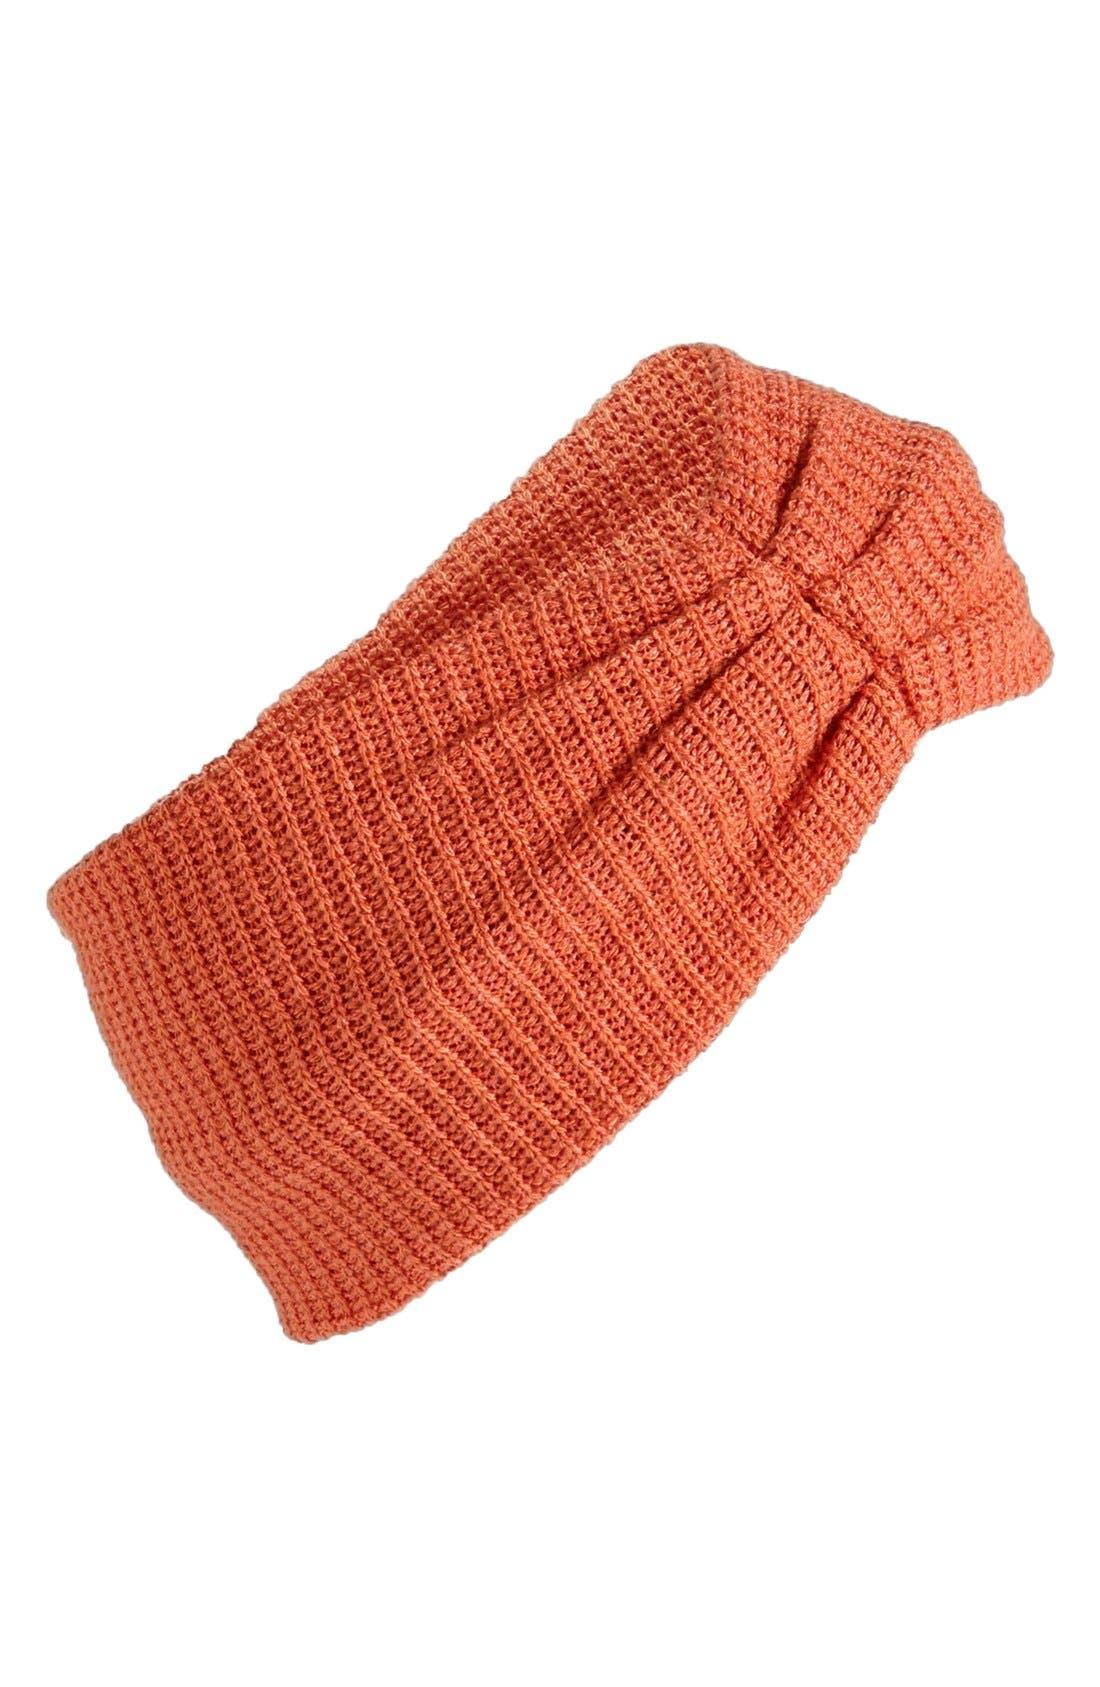 Alternate Image 1 Selected - BP. Ruched Knit Headband (Juniors)